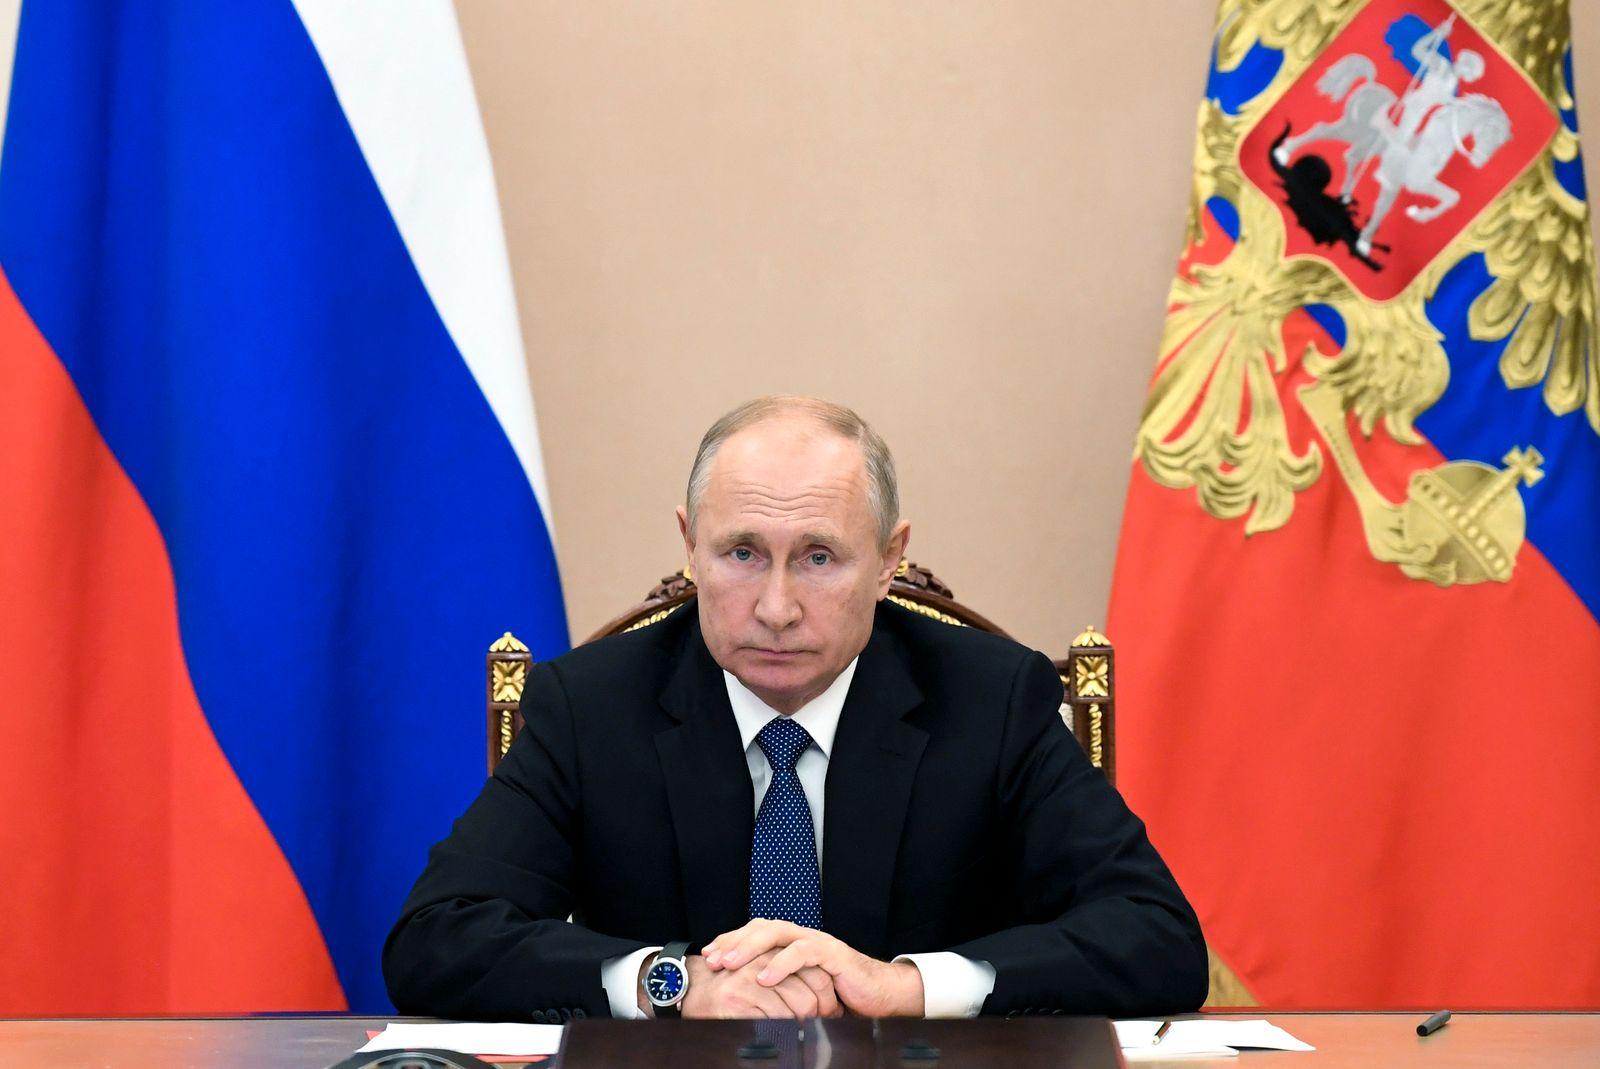 Russischer Präsident Putin bei Videokonferenz